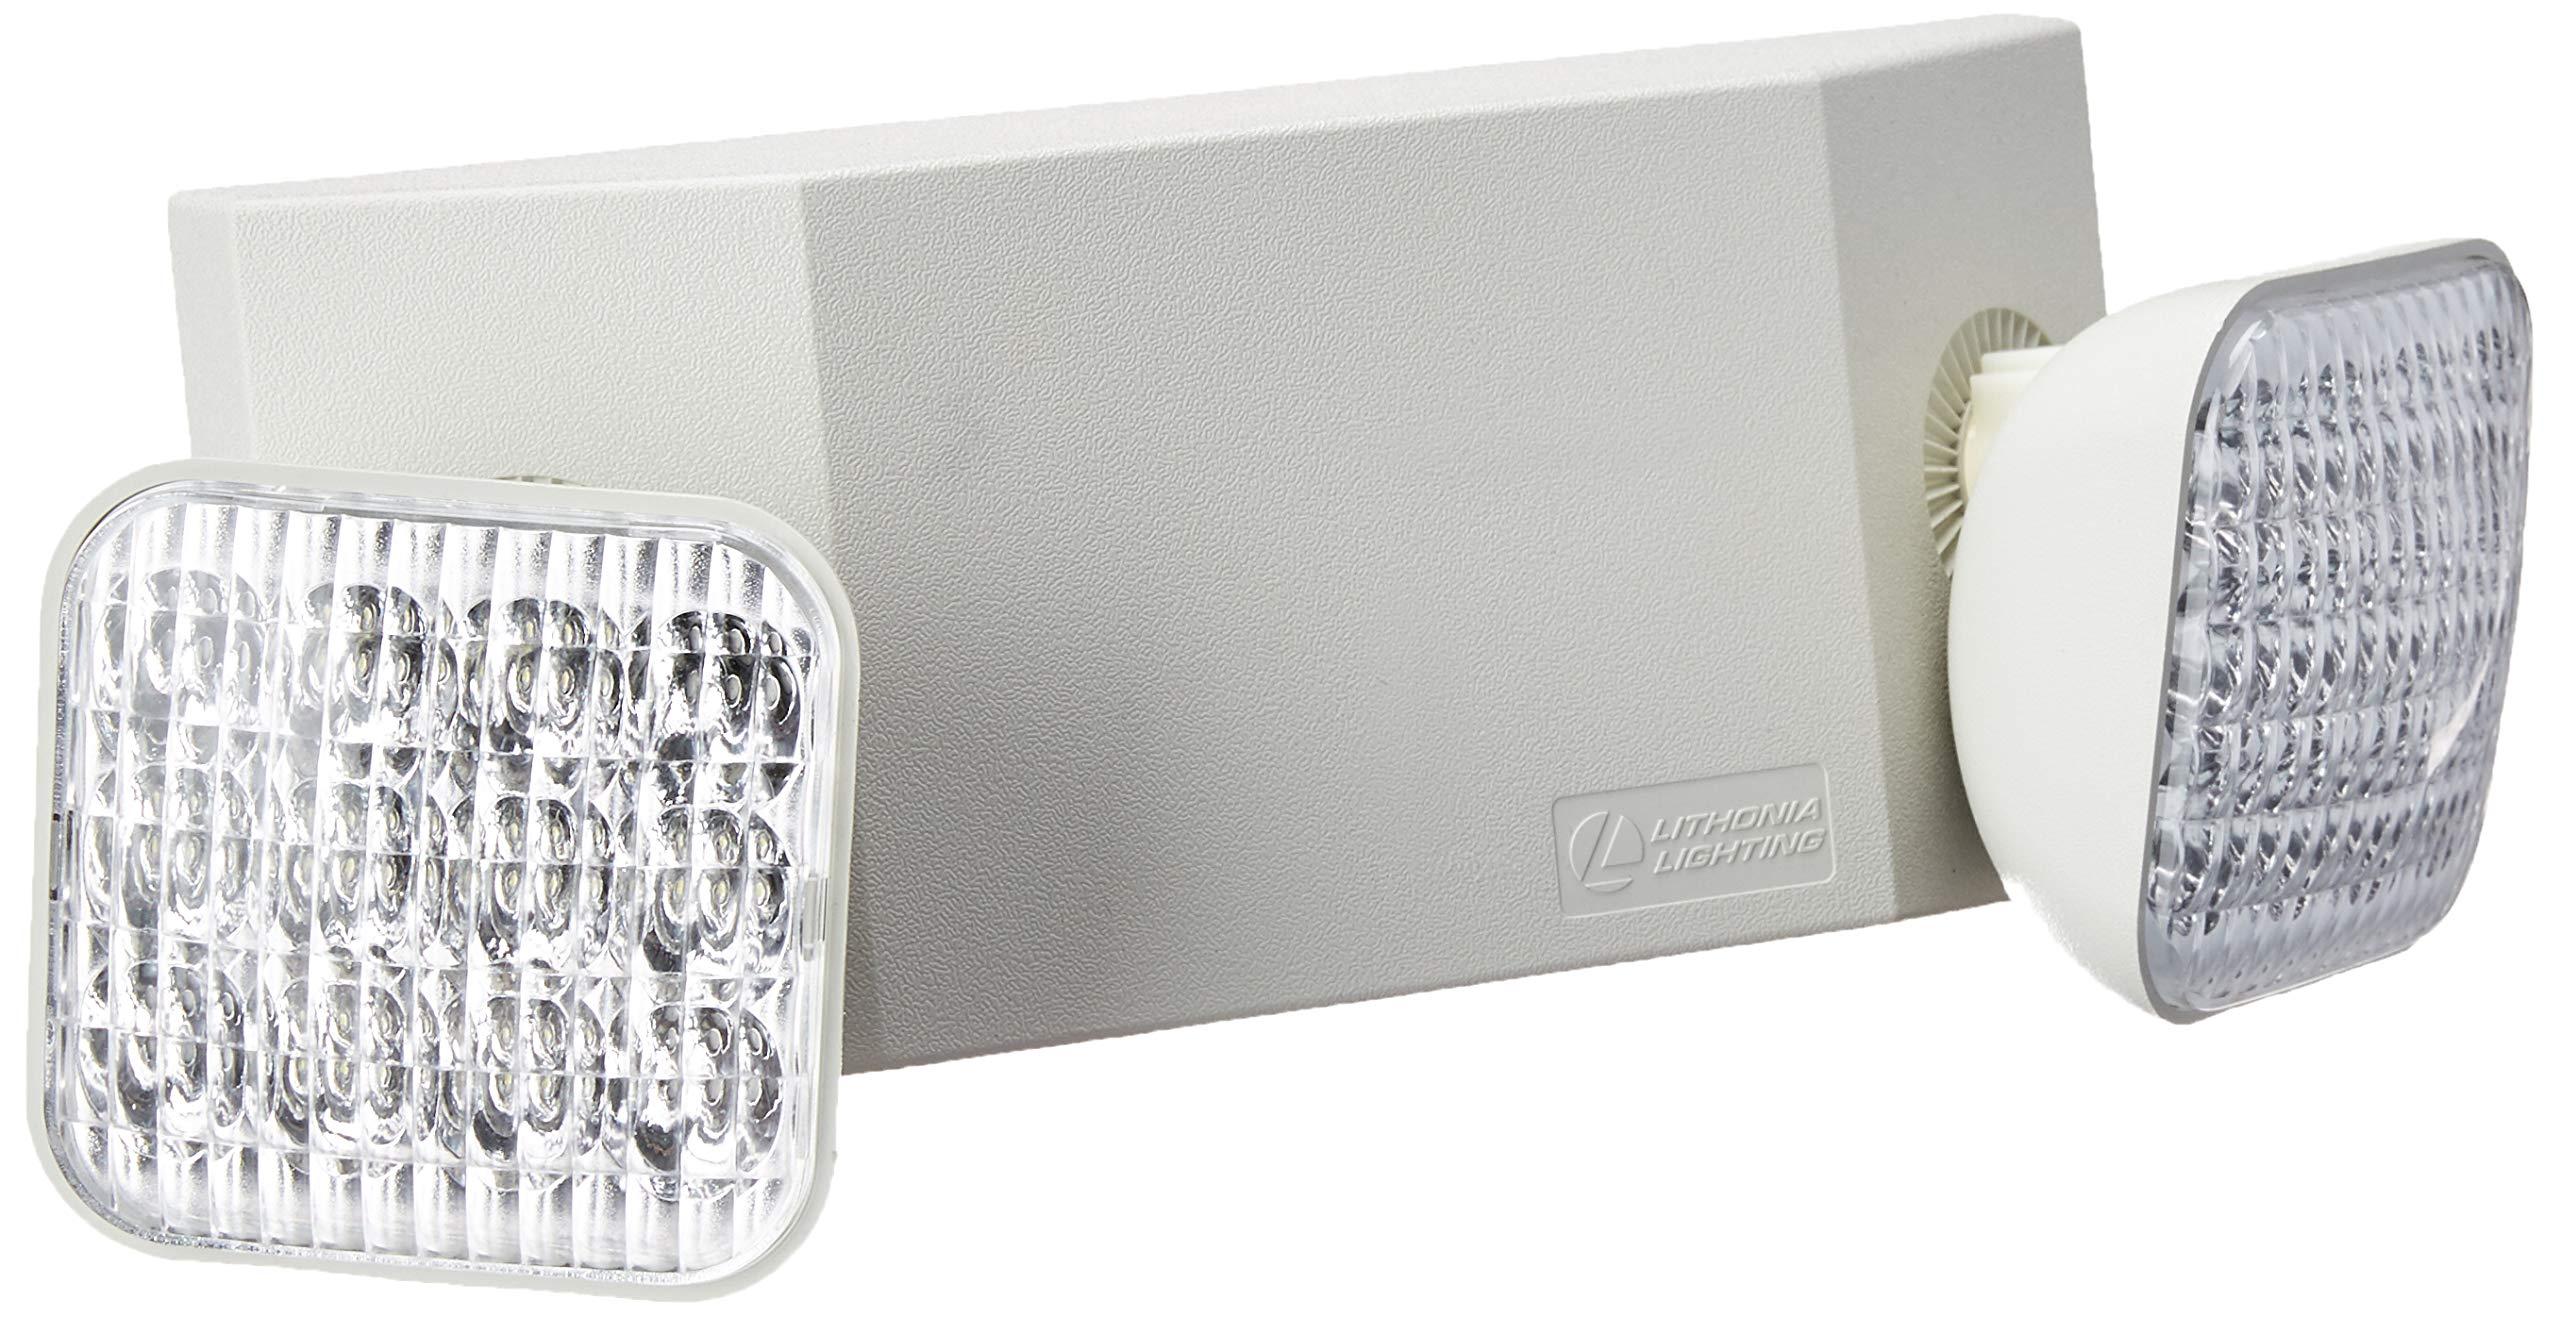 Lithonia Lighting EU2C M6 Emergency Light, Generation 3, T20 Compliant by Lithonia Lighting